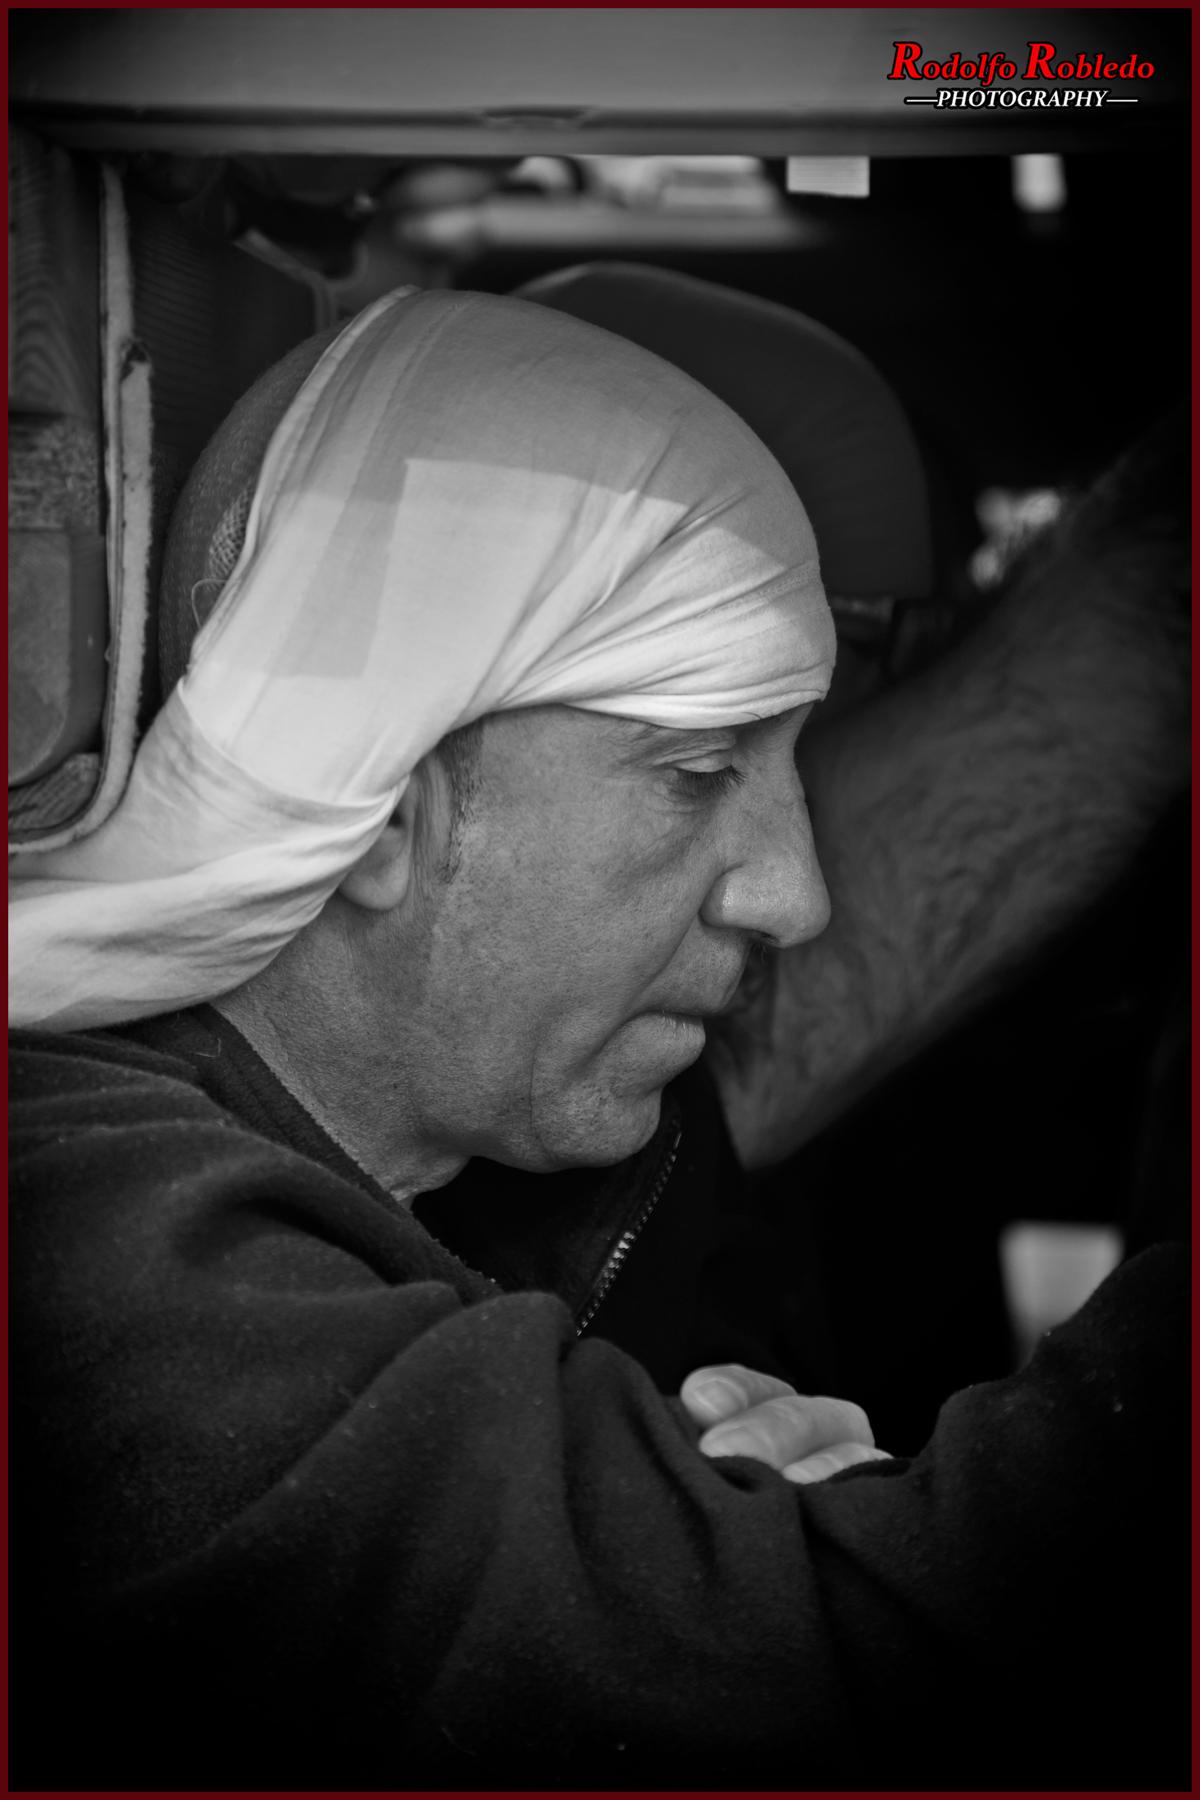 ENSAYO COSTALEROS 20016 - Rodolfo Robledo 07/02/2016 5